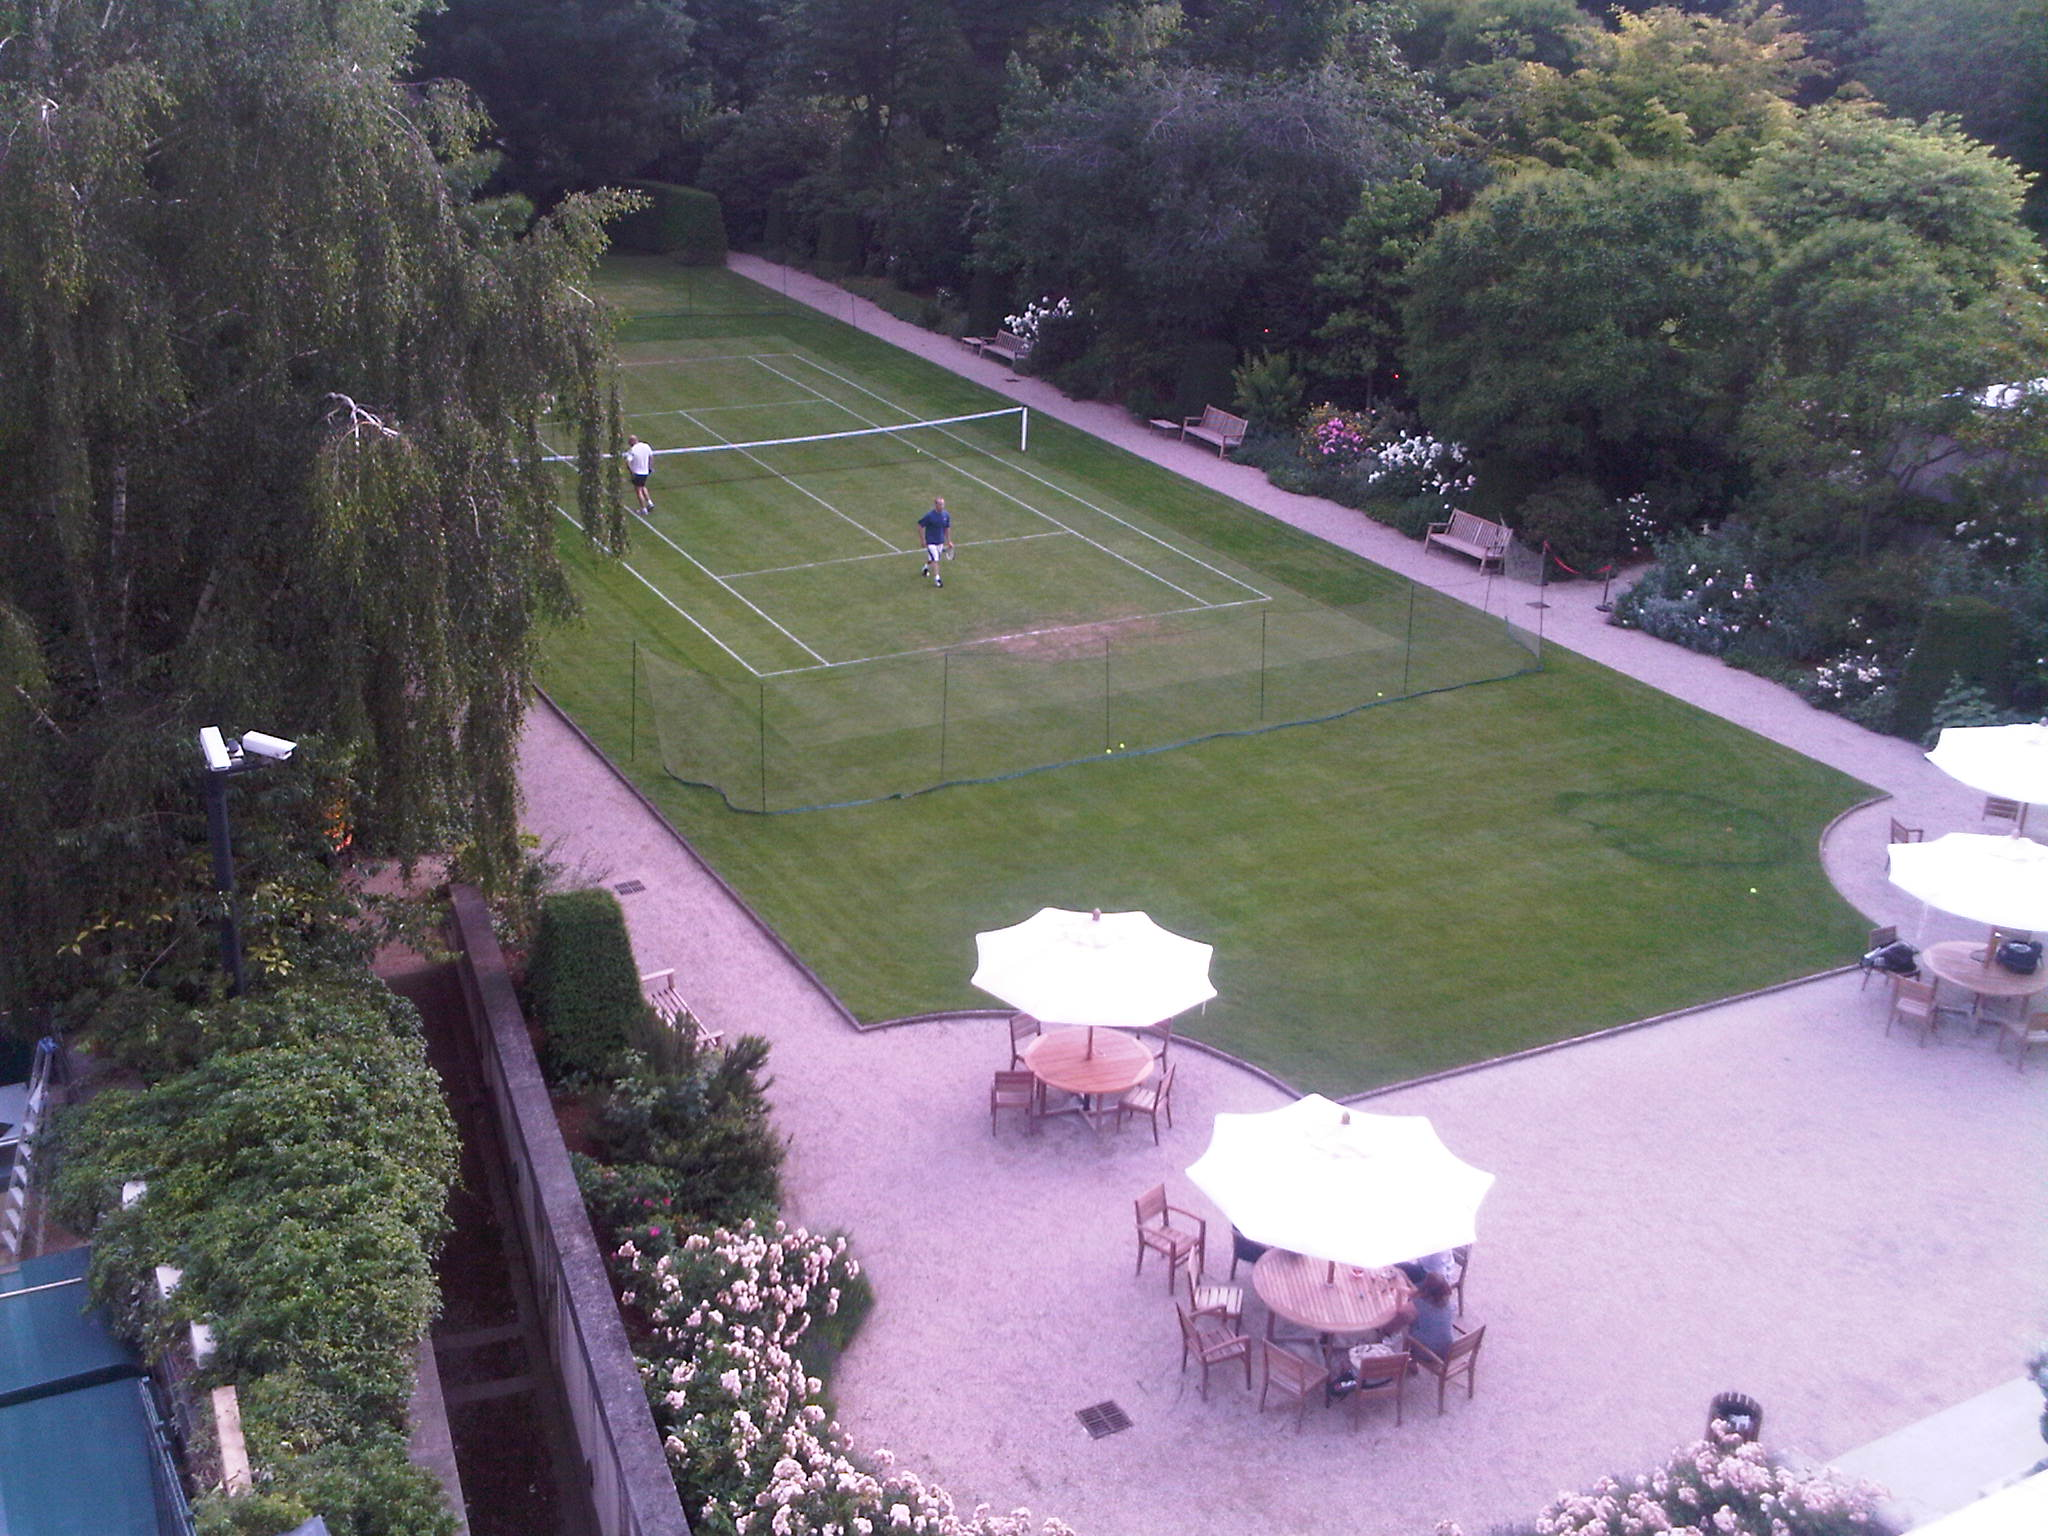 tennis-gazon-ambassade-angleterre-paris